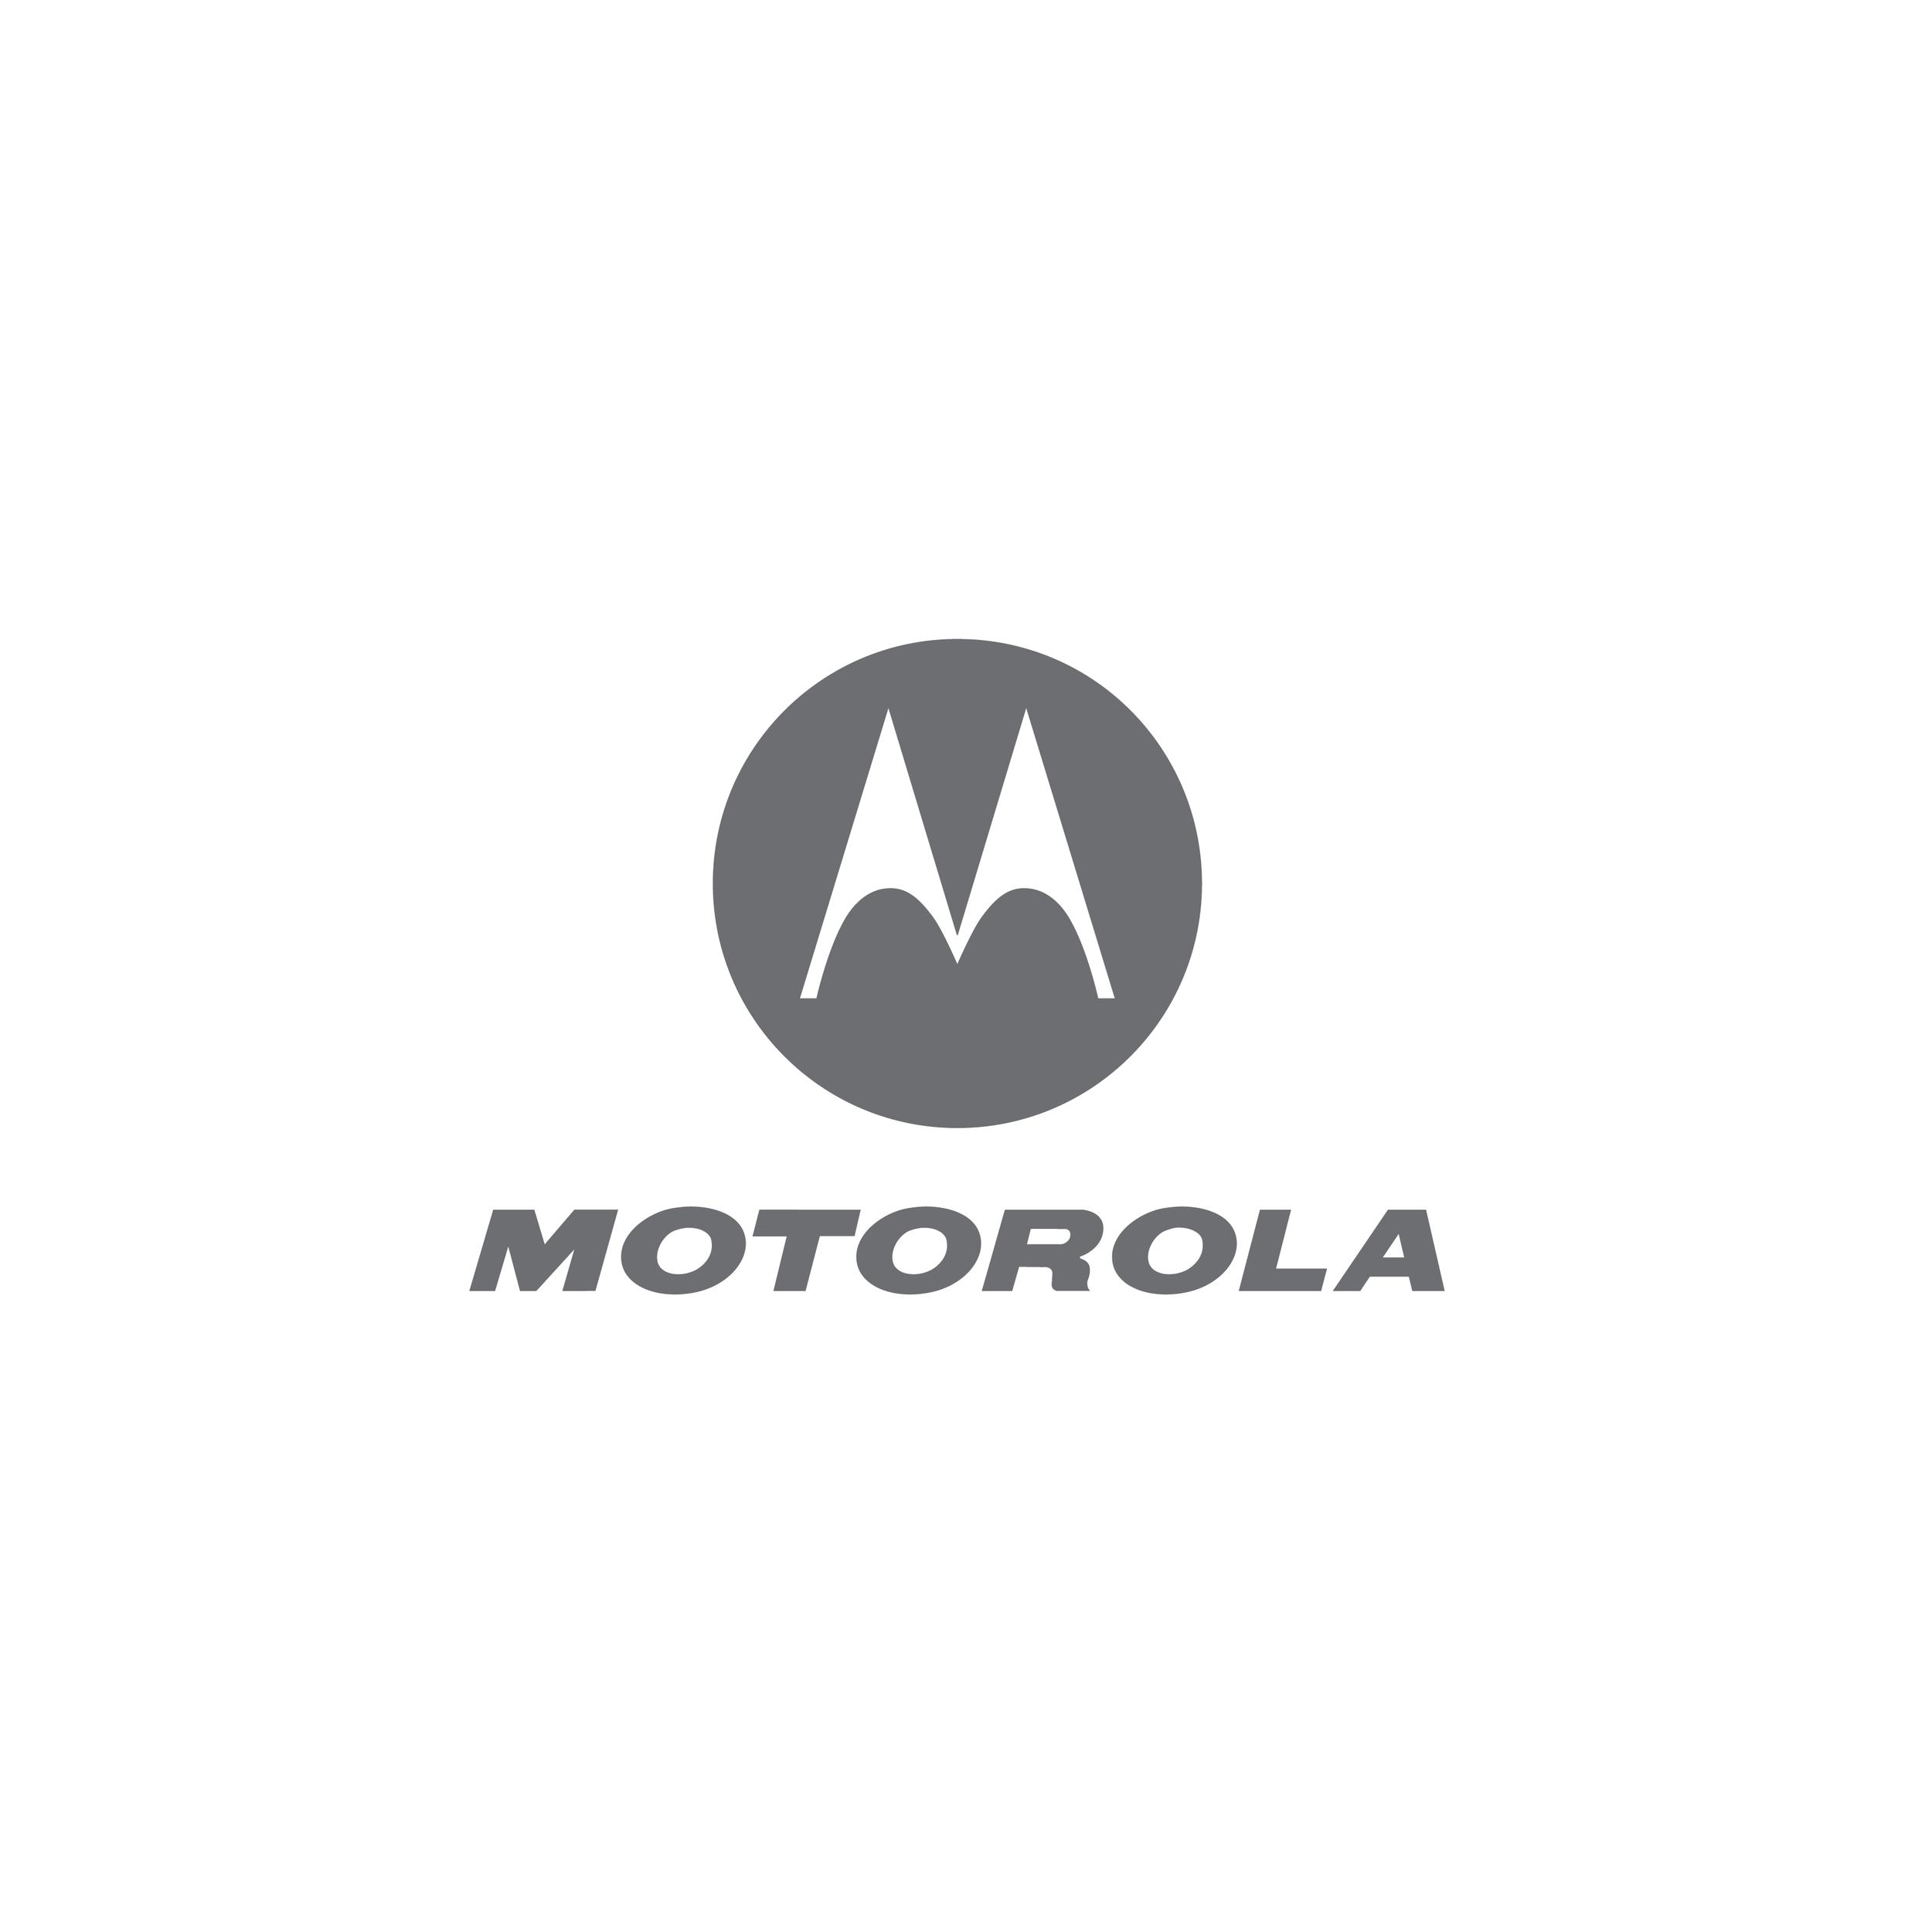 Logo-18-Motorola.jpg